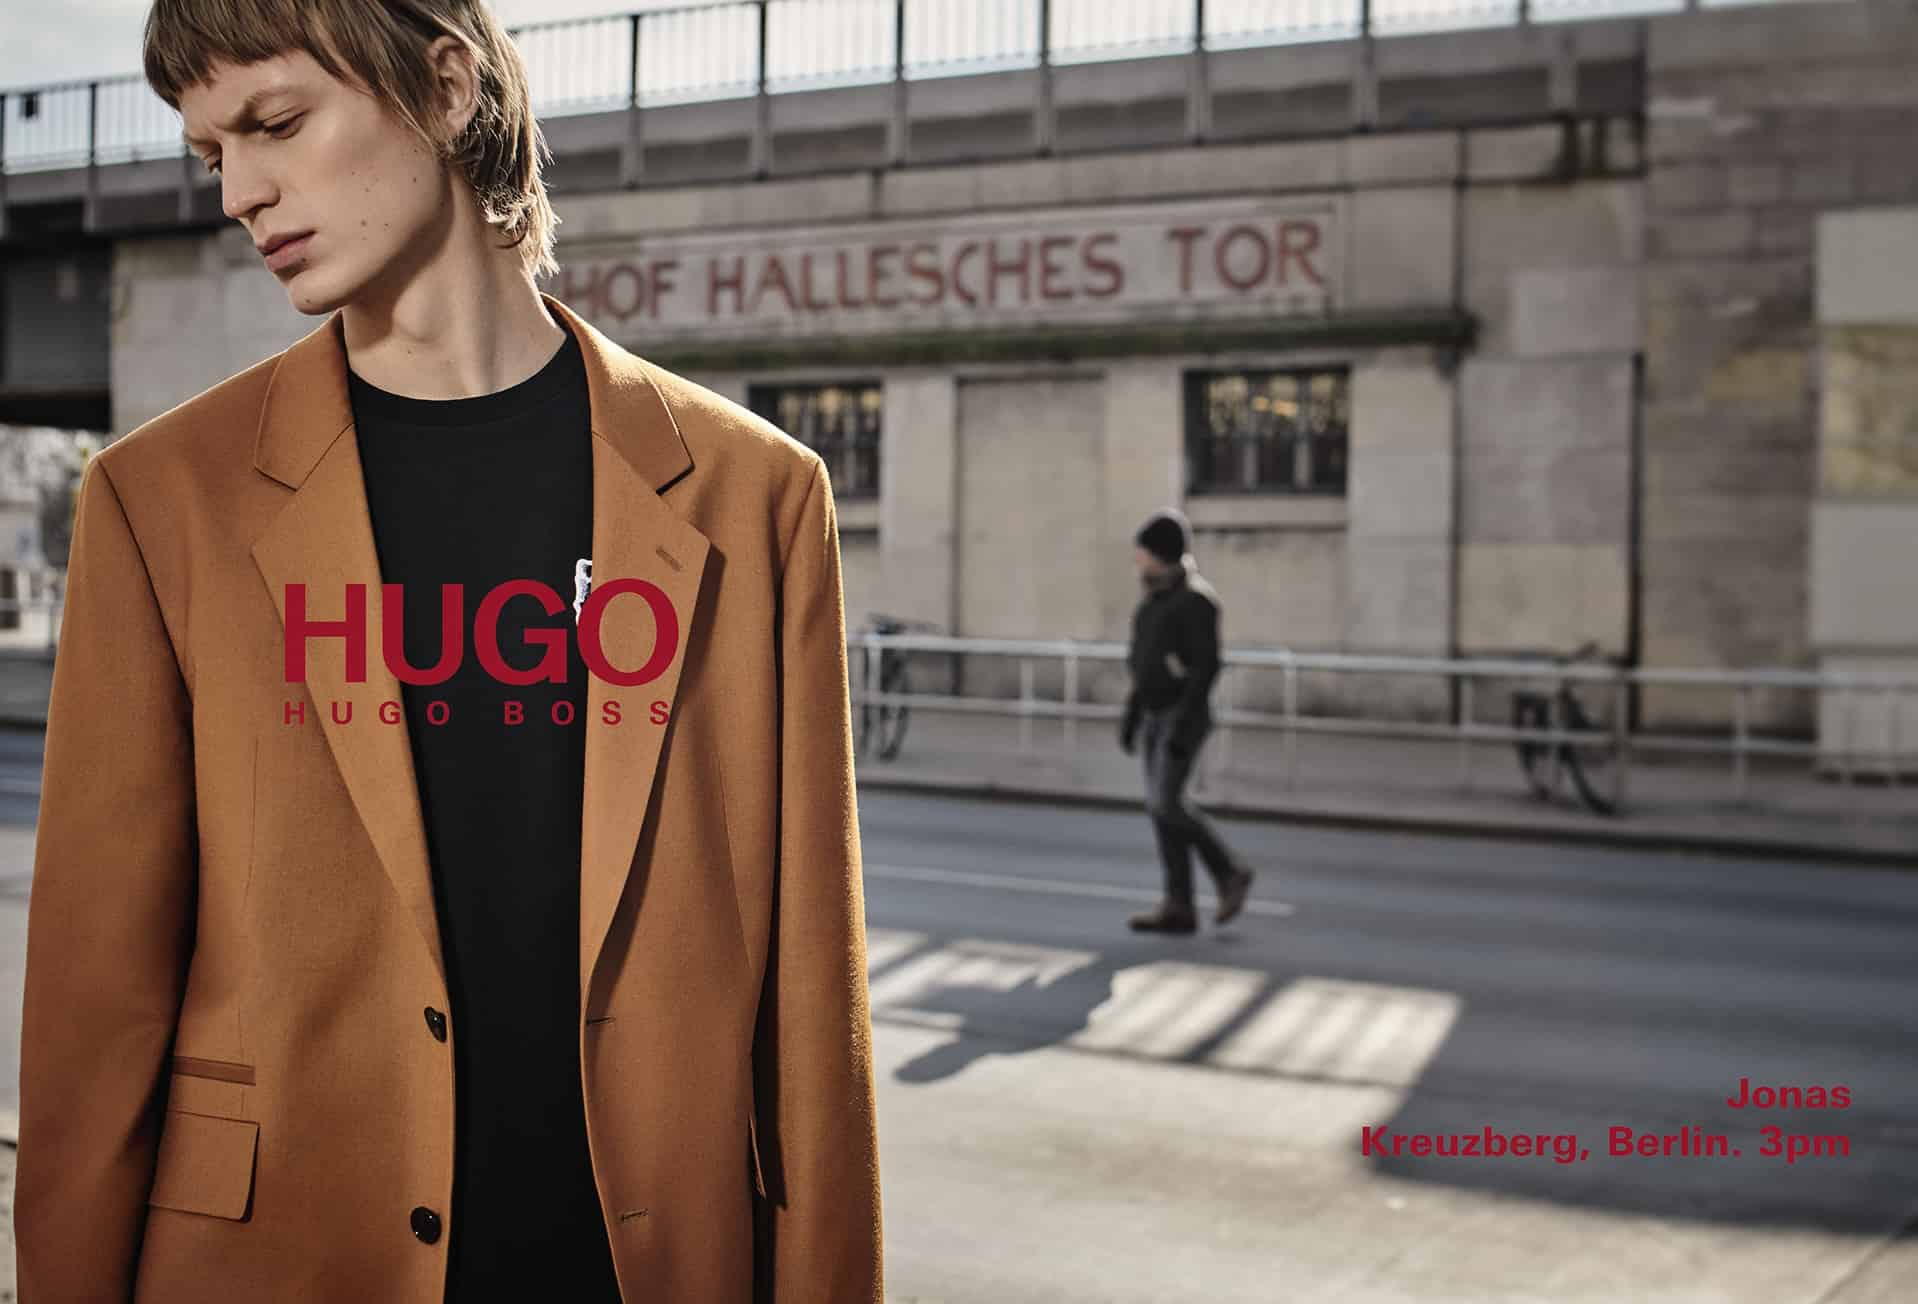 hugo boss new collection 2018